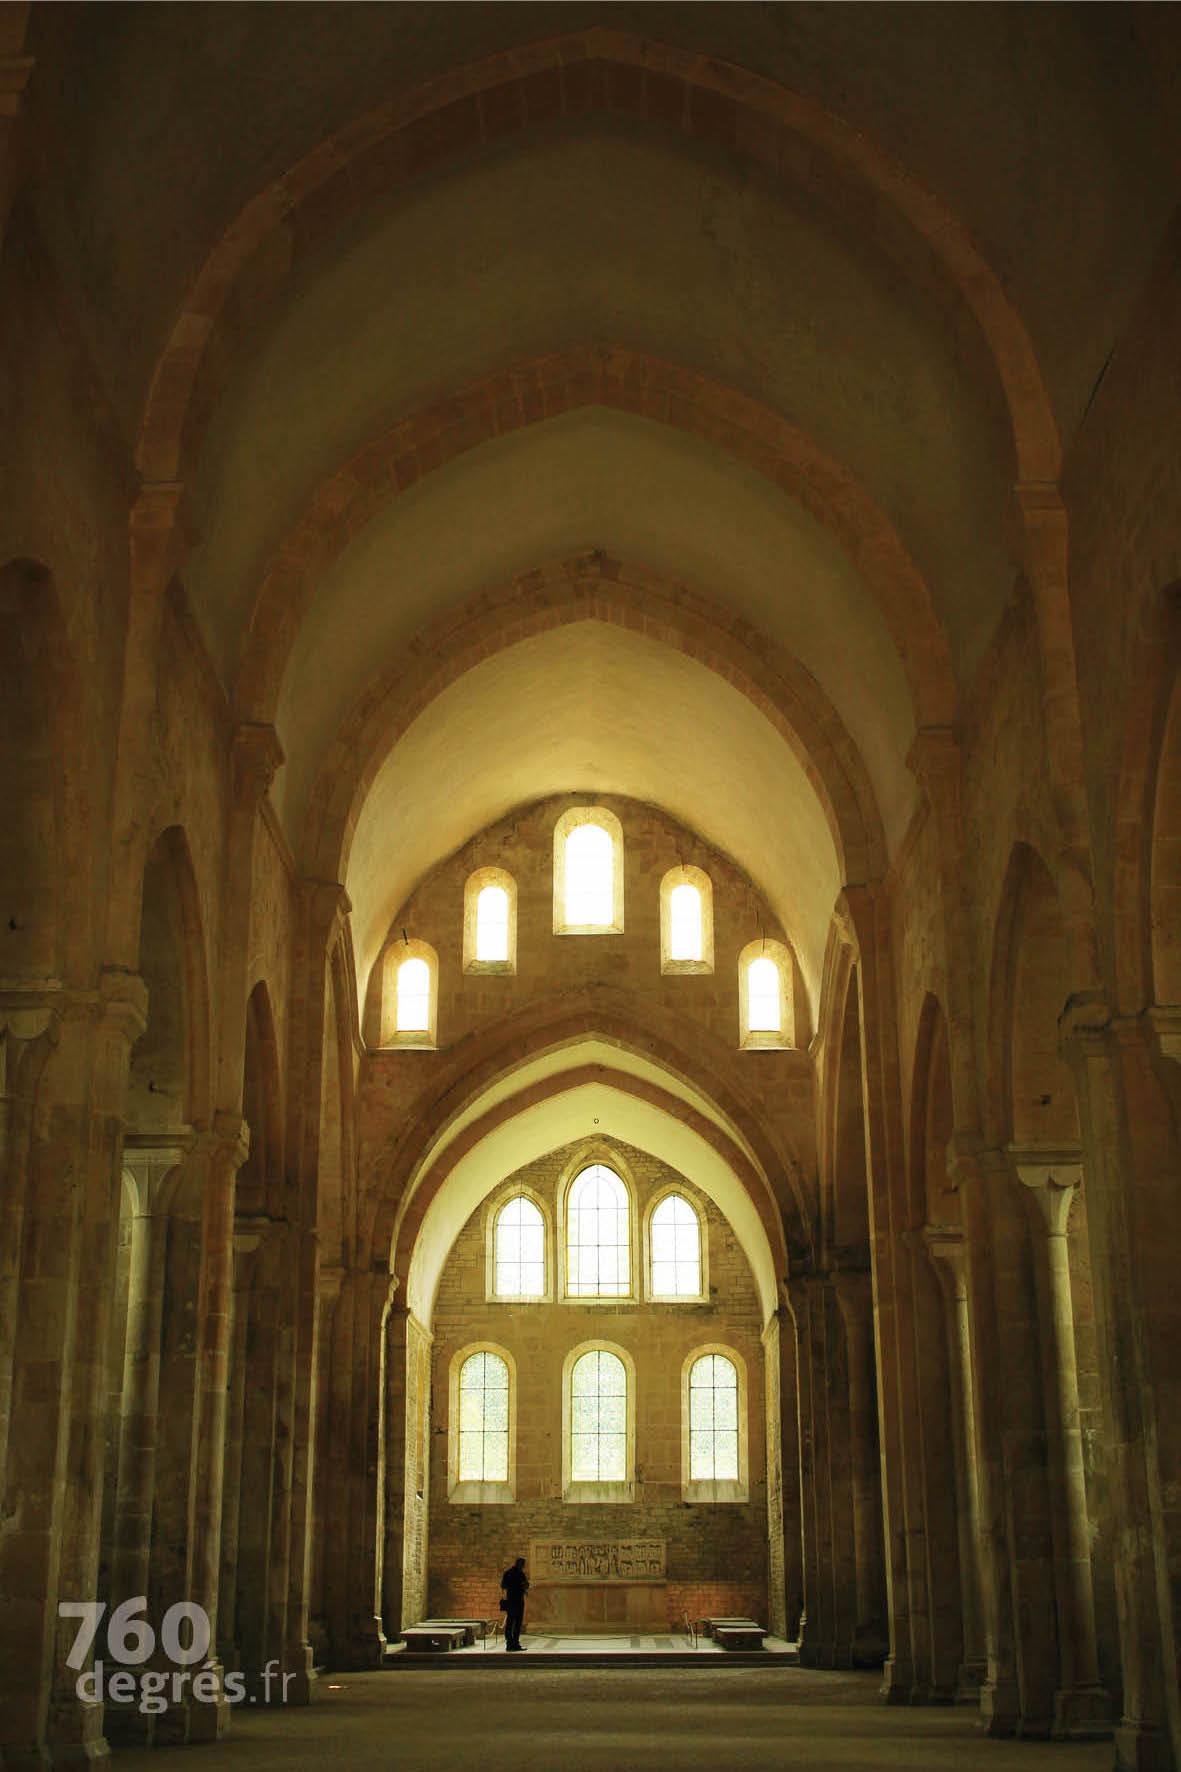 760degres-abbaye-fontenay-04